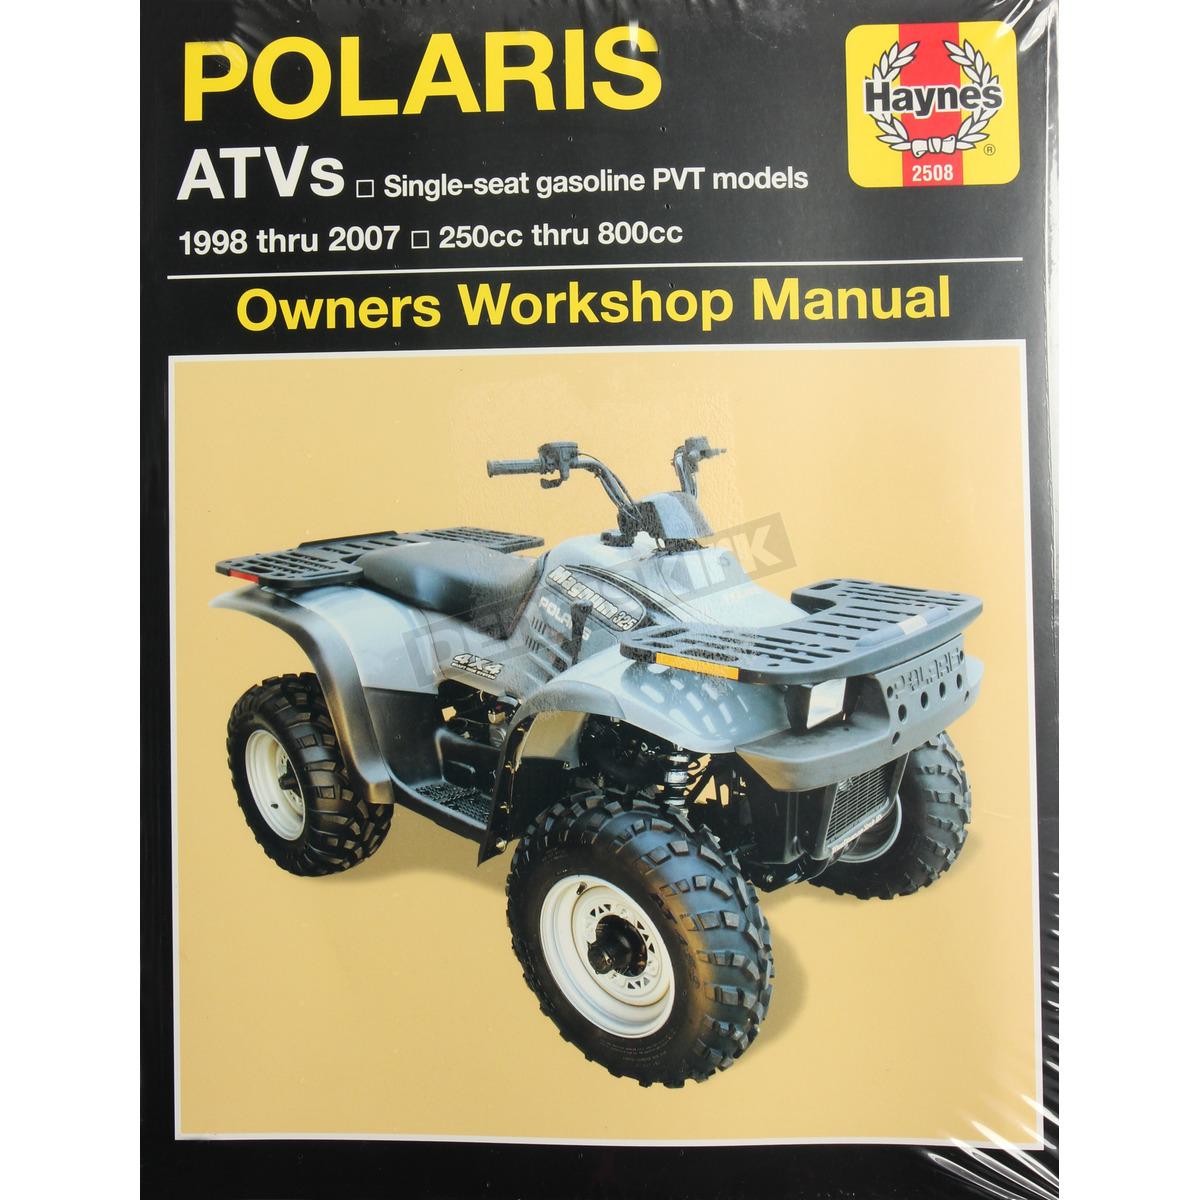 hight resolution of polaris repair manual 2508